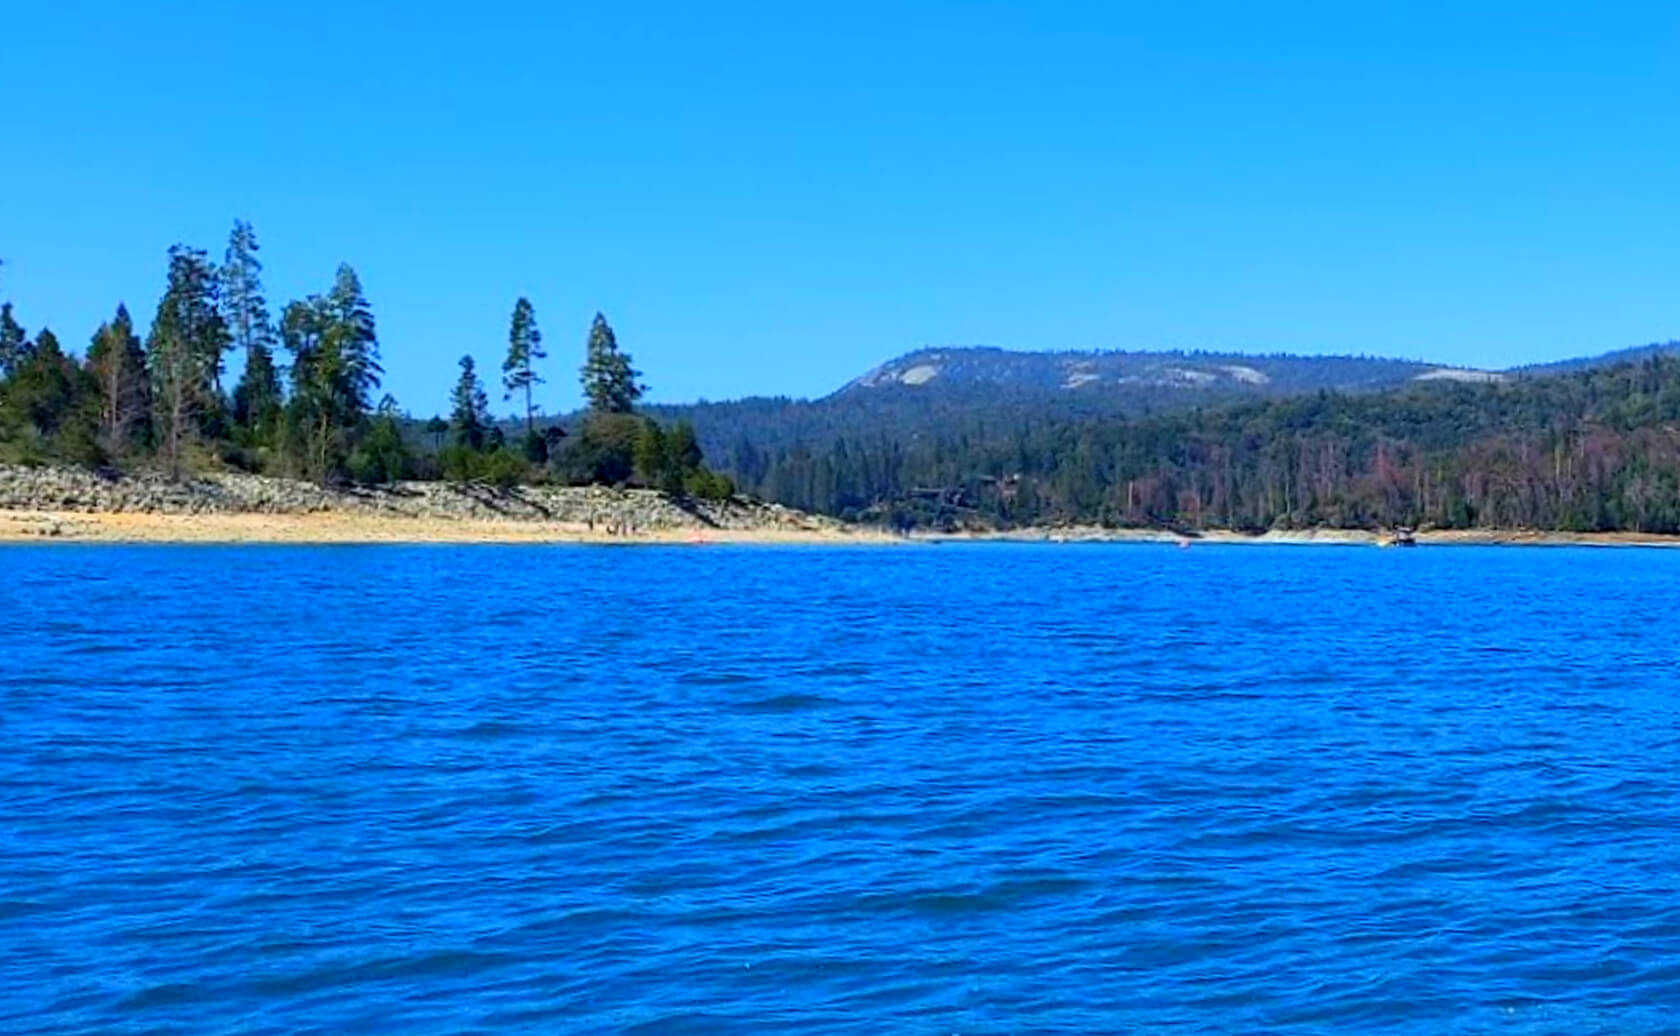 Bass-Lake-Reservoir-Fishing-Guide-Report-California-02